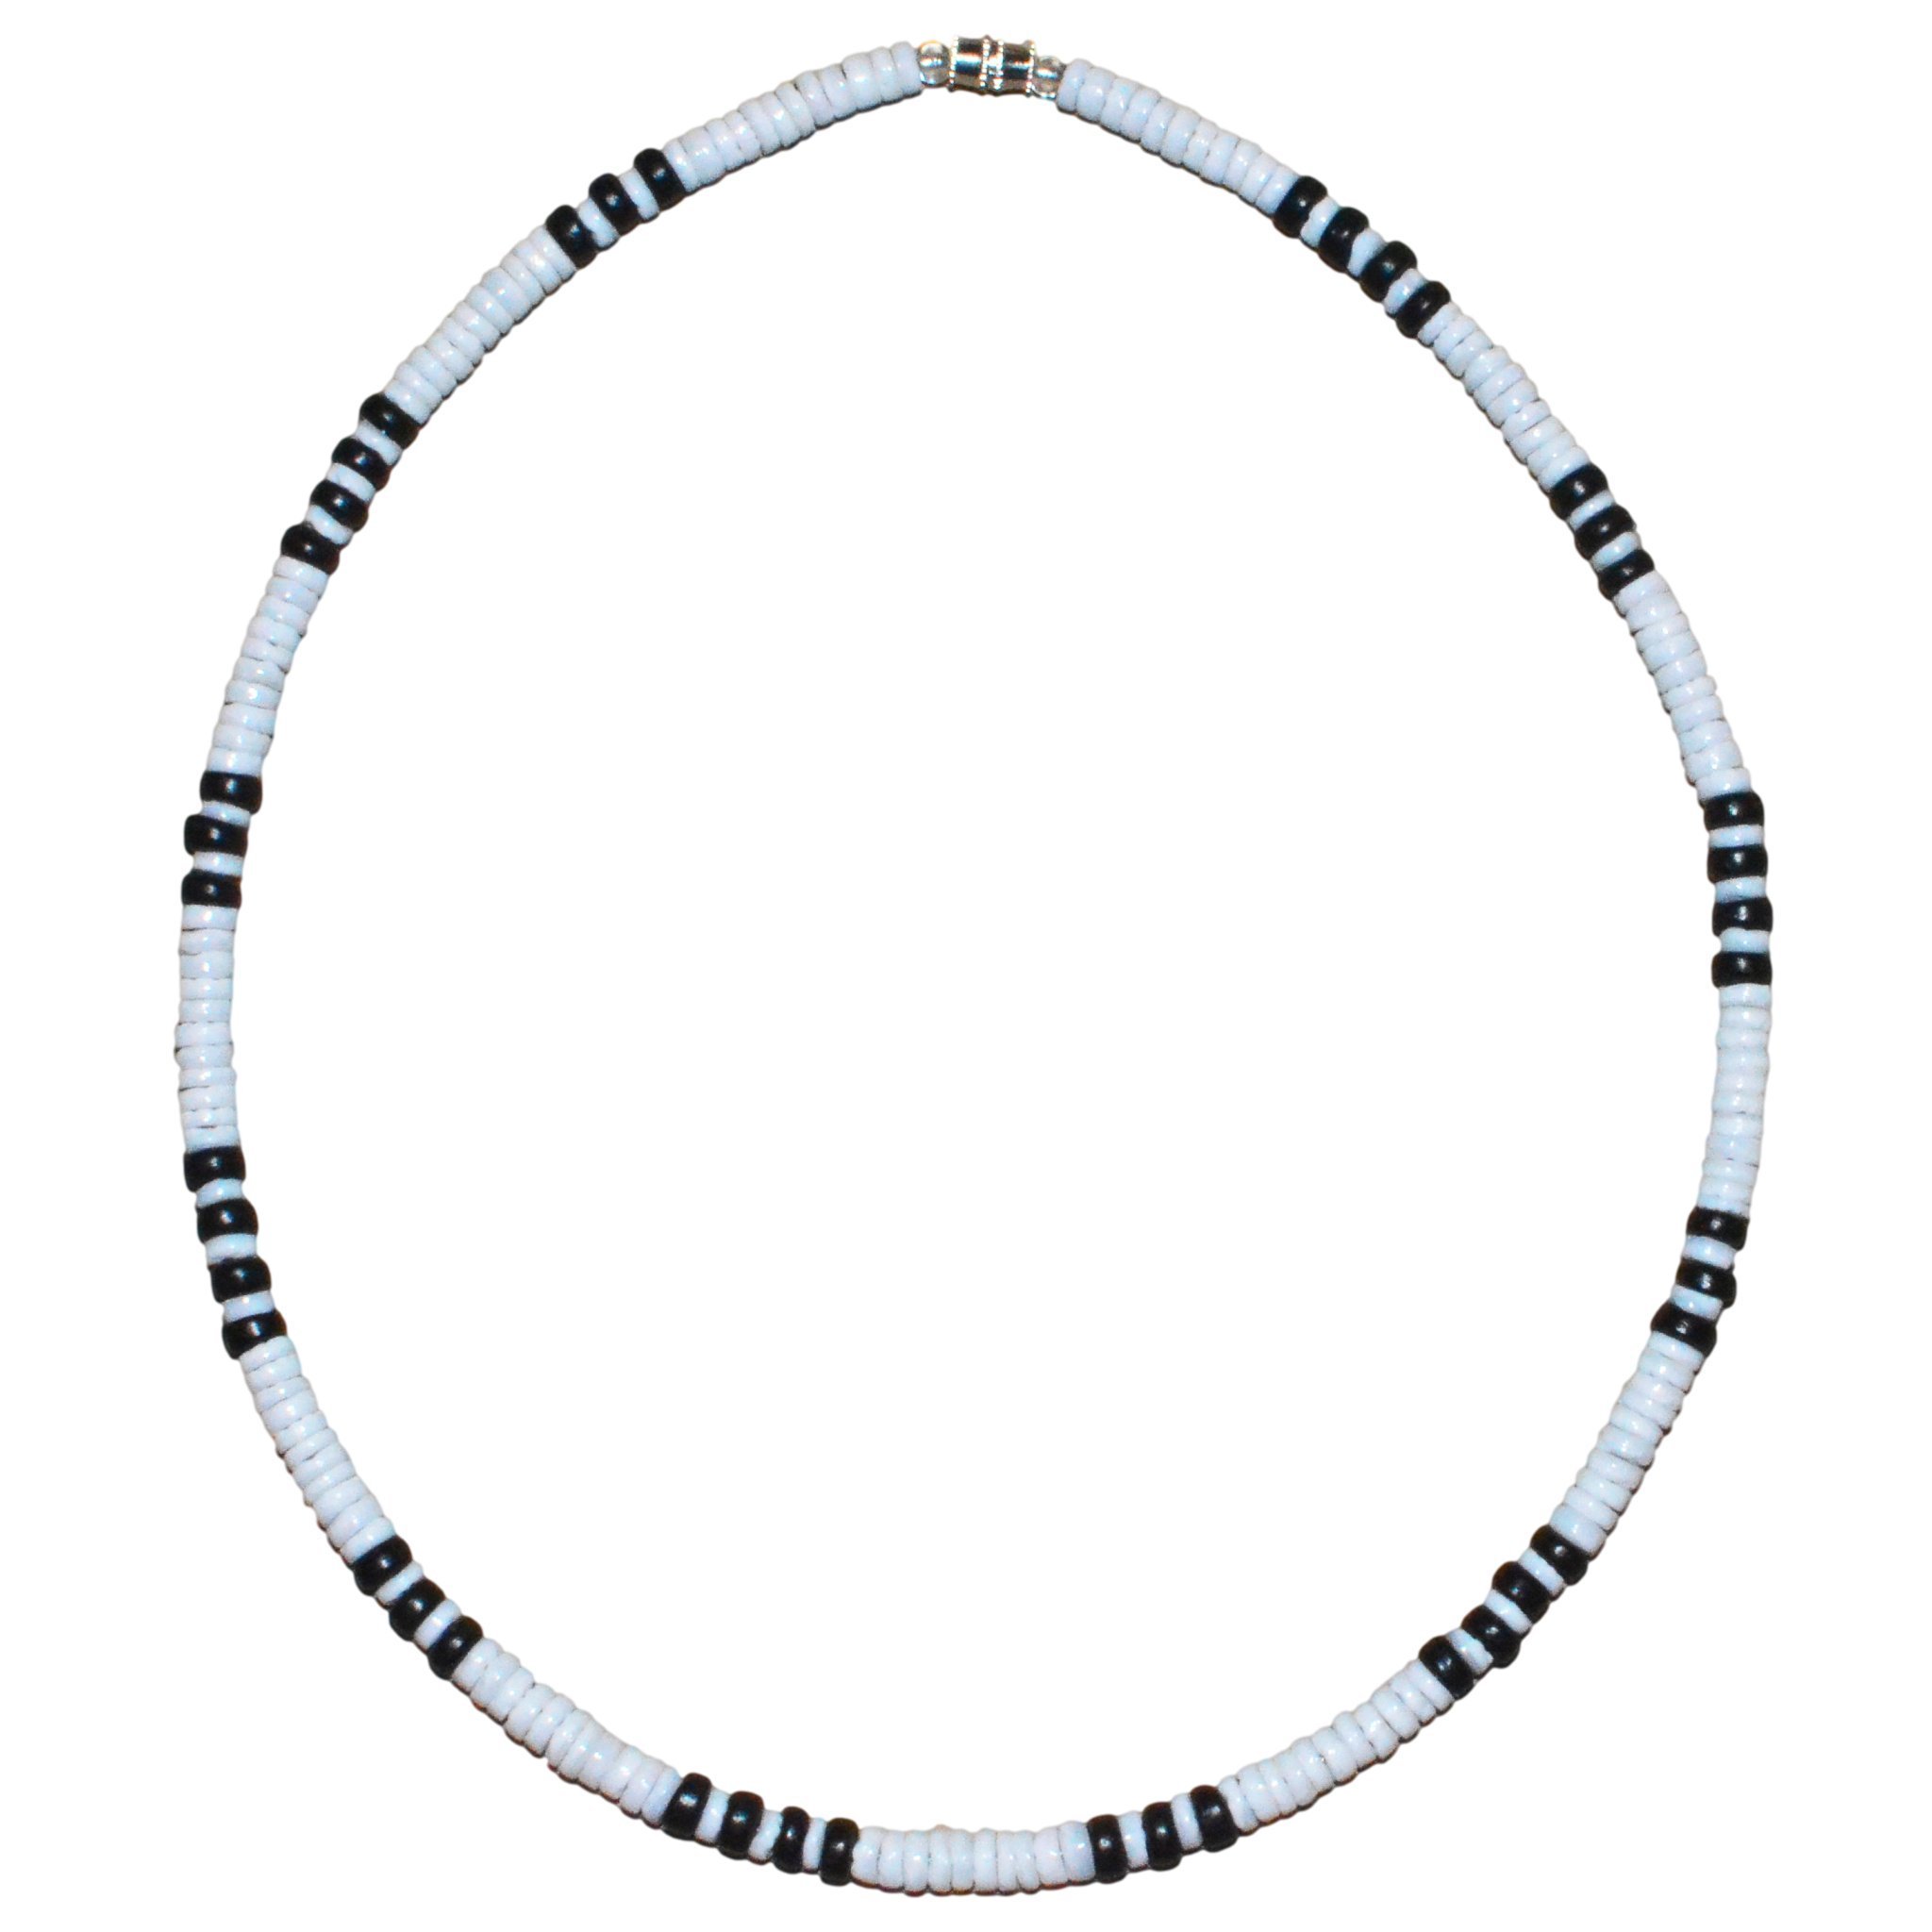 Native Treasure - 18'' White Heishe Puka Shell Black Coco Necklace - 5mm (3/16'')